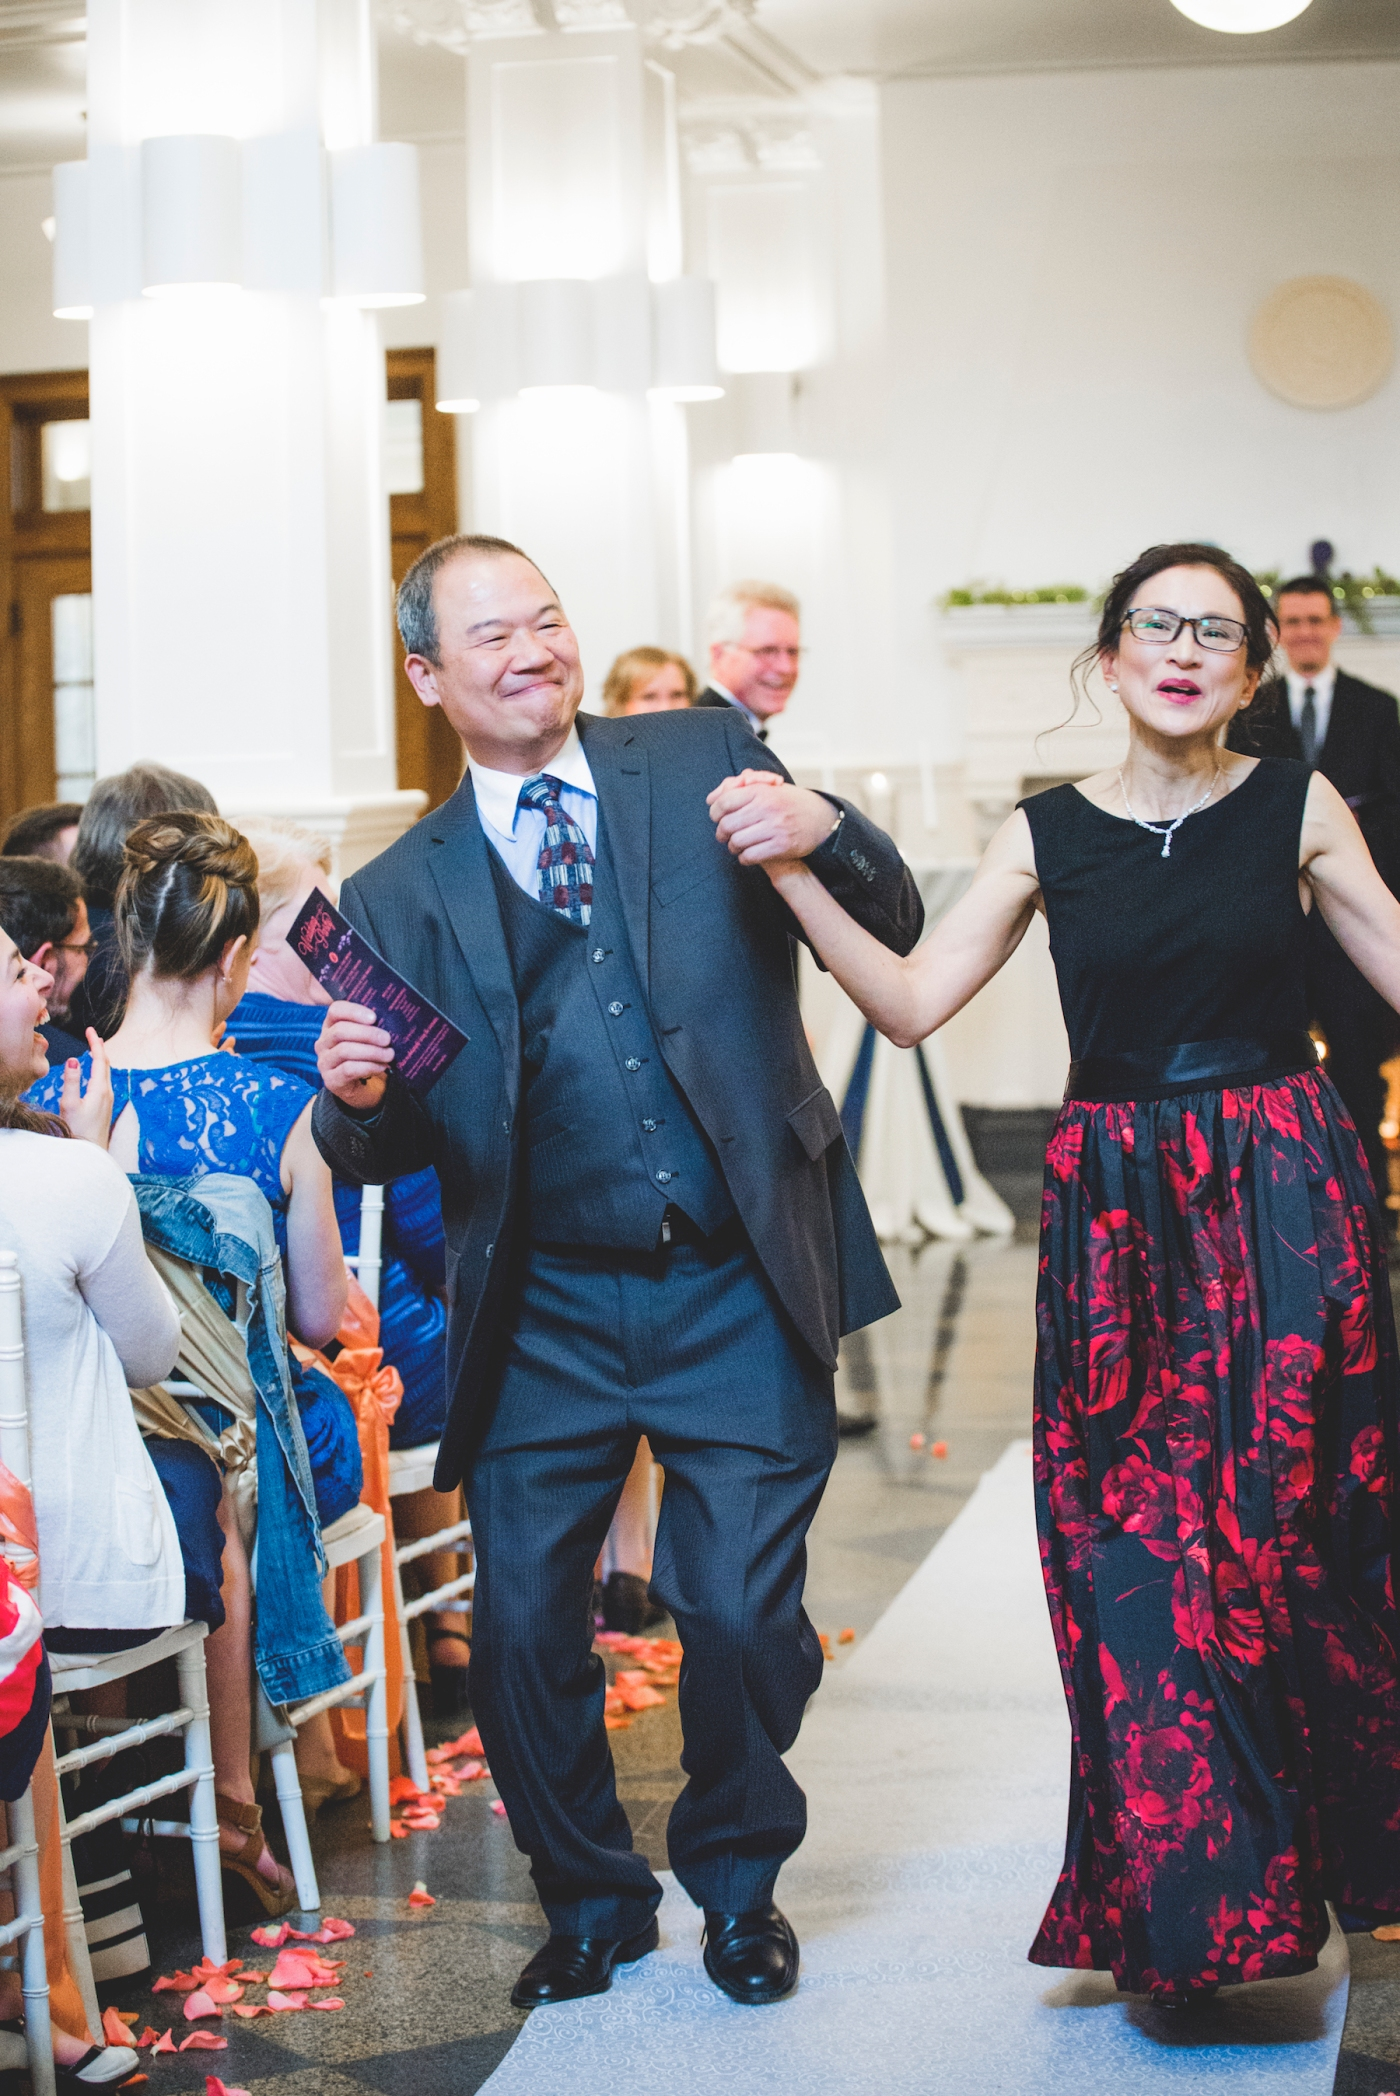 DSC_2781Everett_Wedding_Ballroom_Jane_Speleers_photography_Rachel_and_Edmund_Ceremony_2017